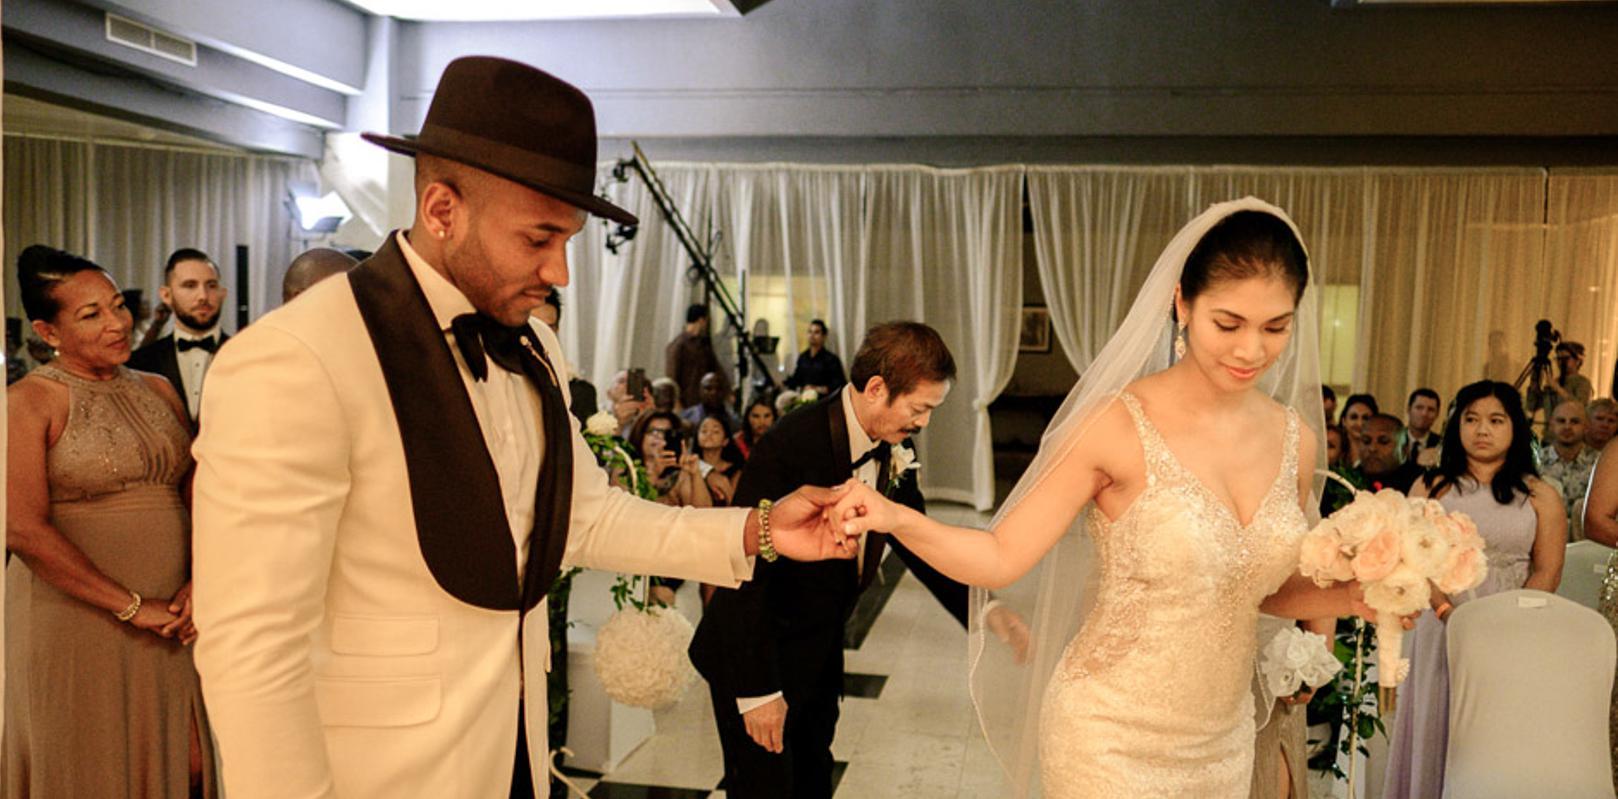 bodas-sin-clasificar-sin-tema-cuba-41322.jpg